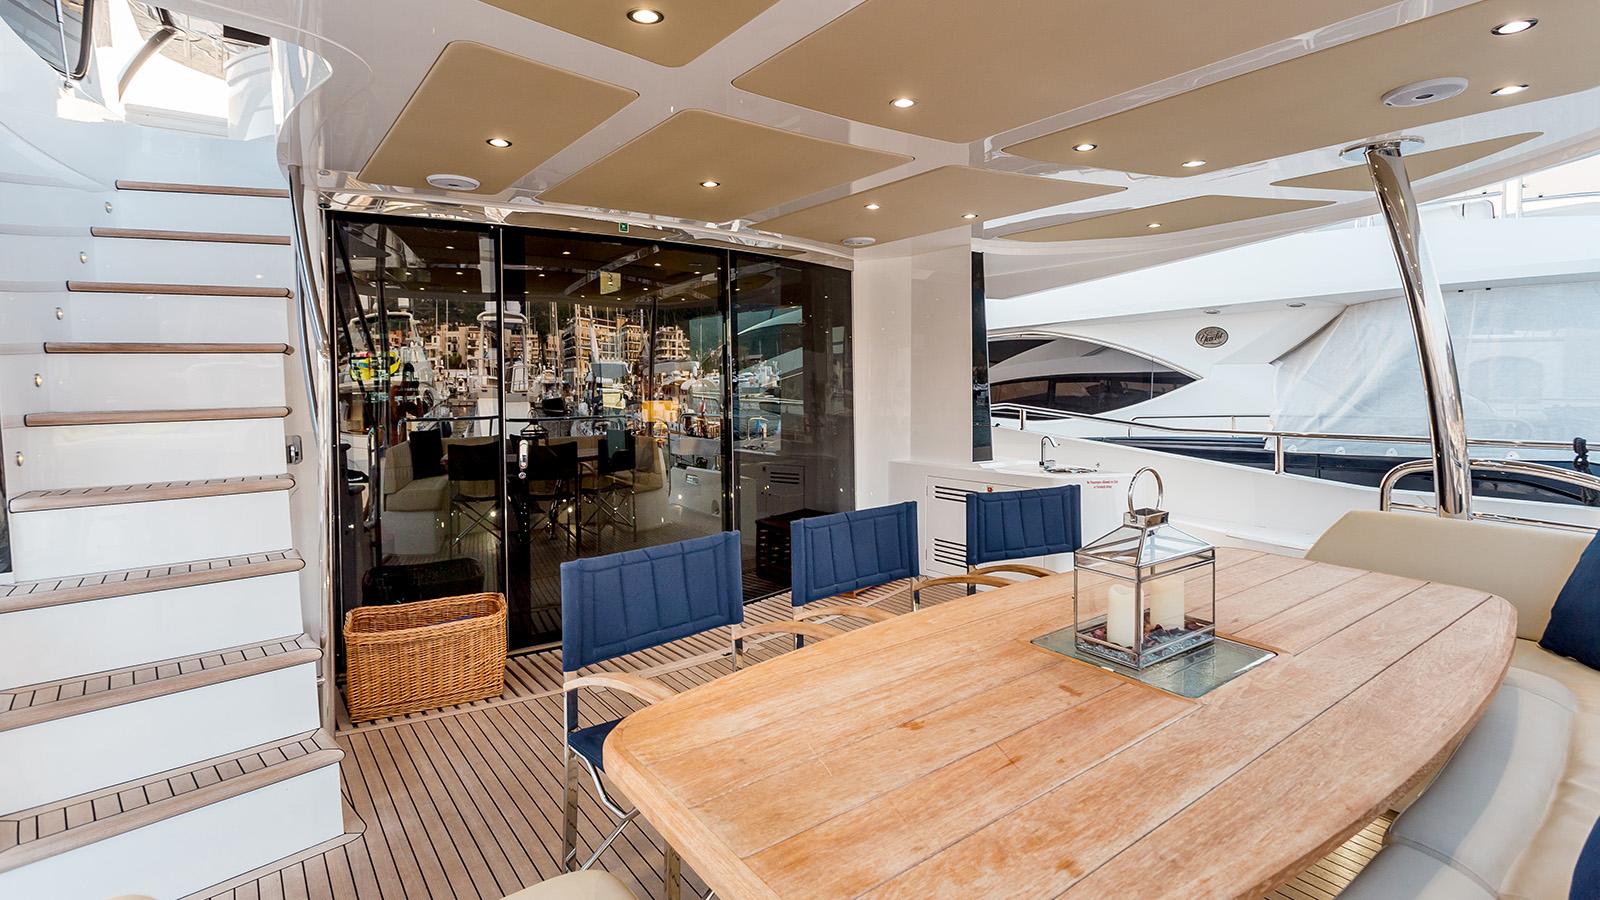 Sunseeker 86 Yacht - Stardust of Poole - Aft Deck